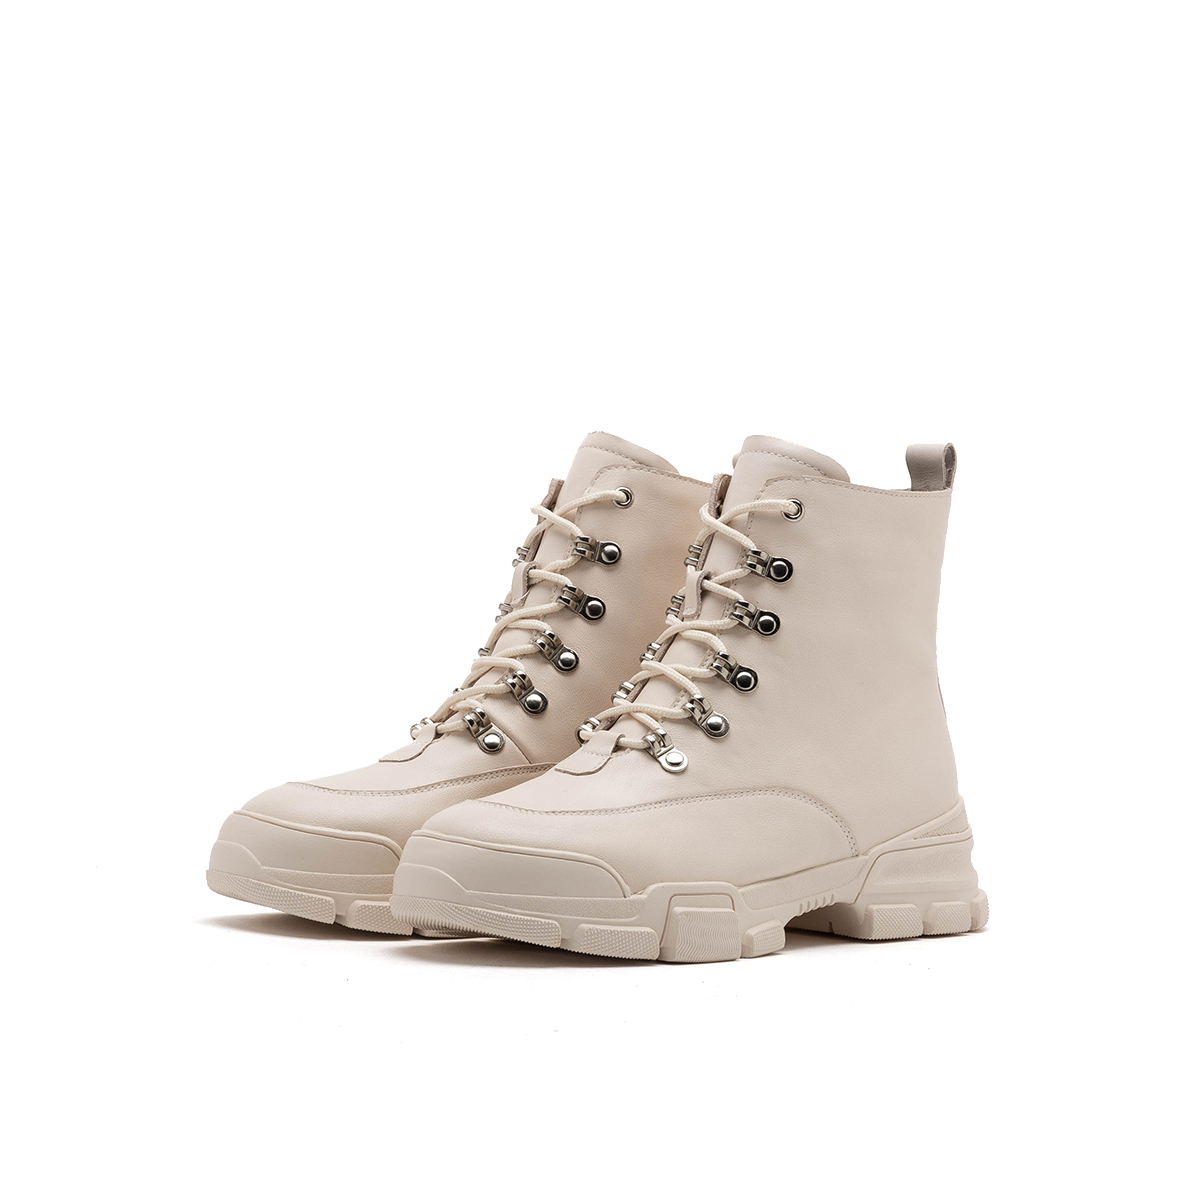 SS93116096 秋冬新款英伦风短靴单靴女鞋 2019 星期六马丁靴 Sat & St